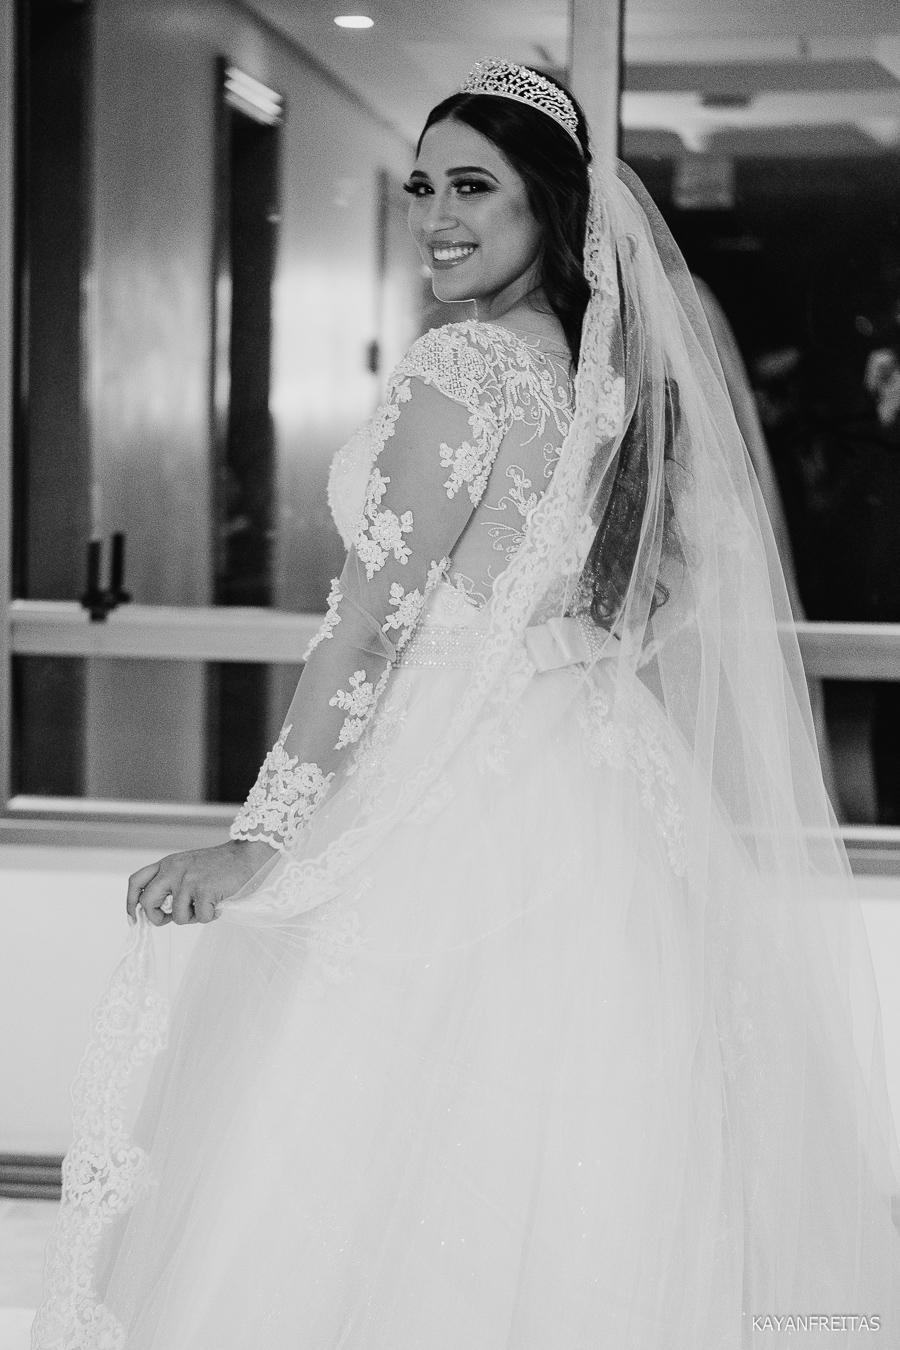 casamento-lic-florianopolis-ariane-diogo-0034 Casamento Ariane e Diogo - LIC Florianópolis